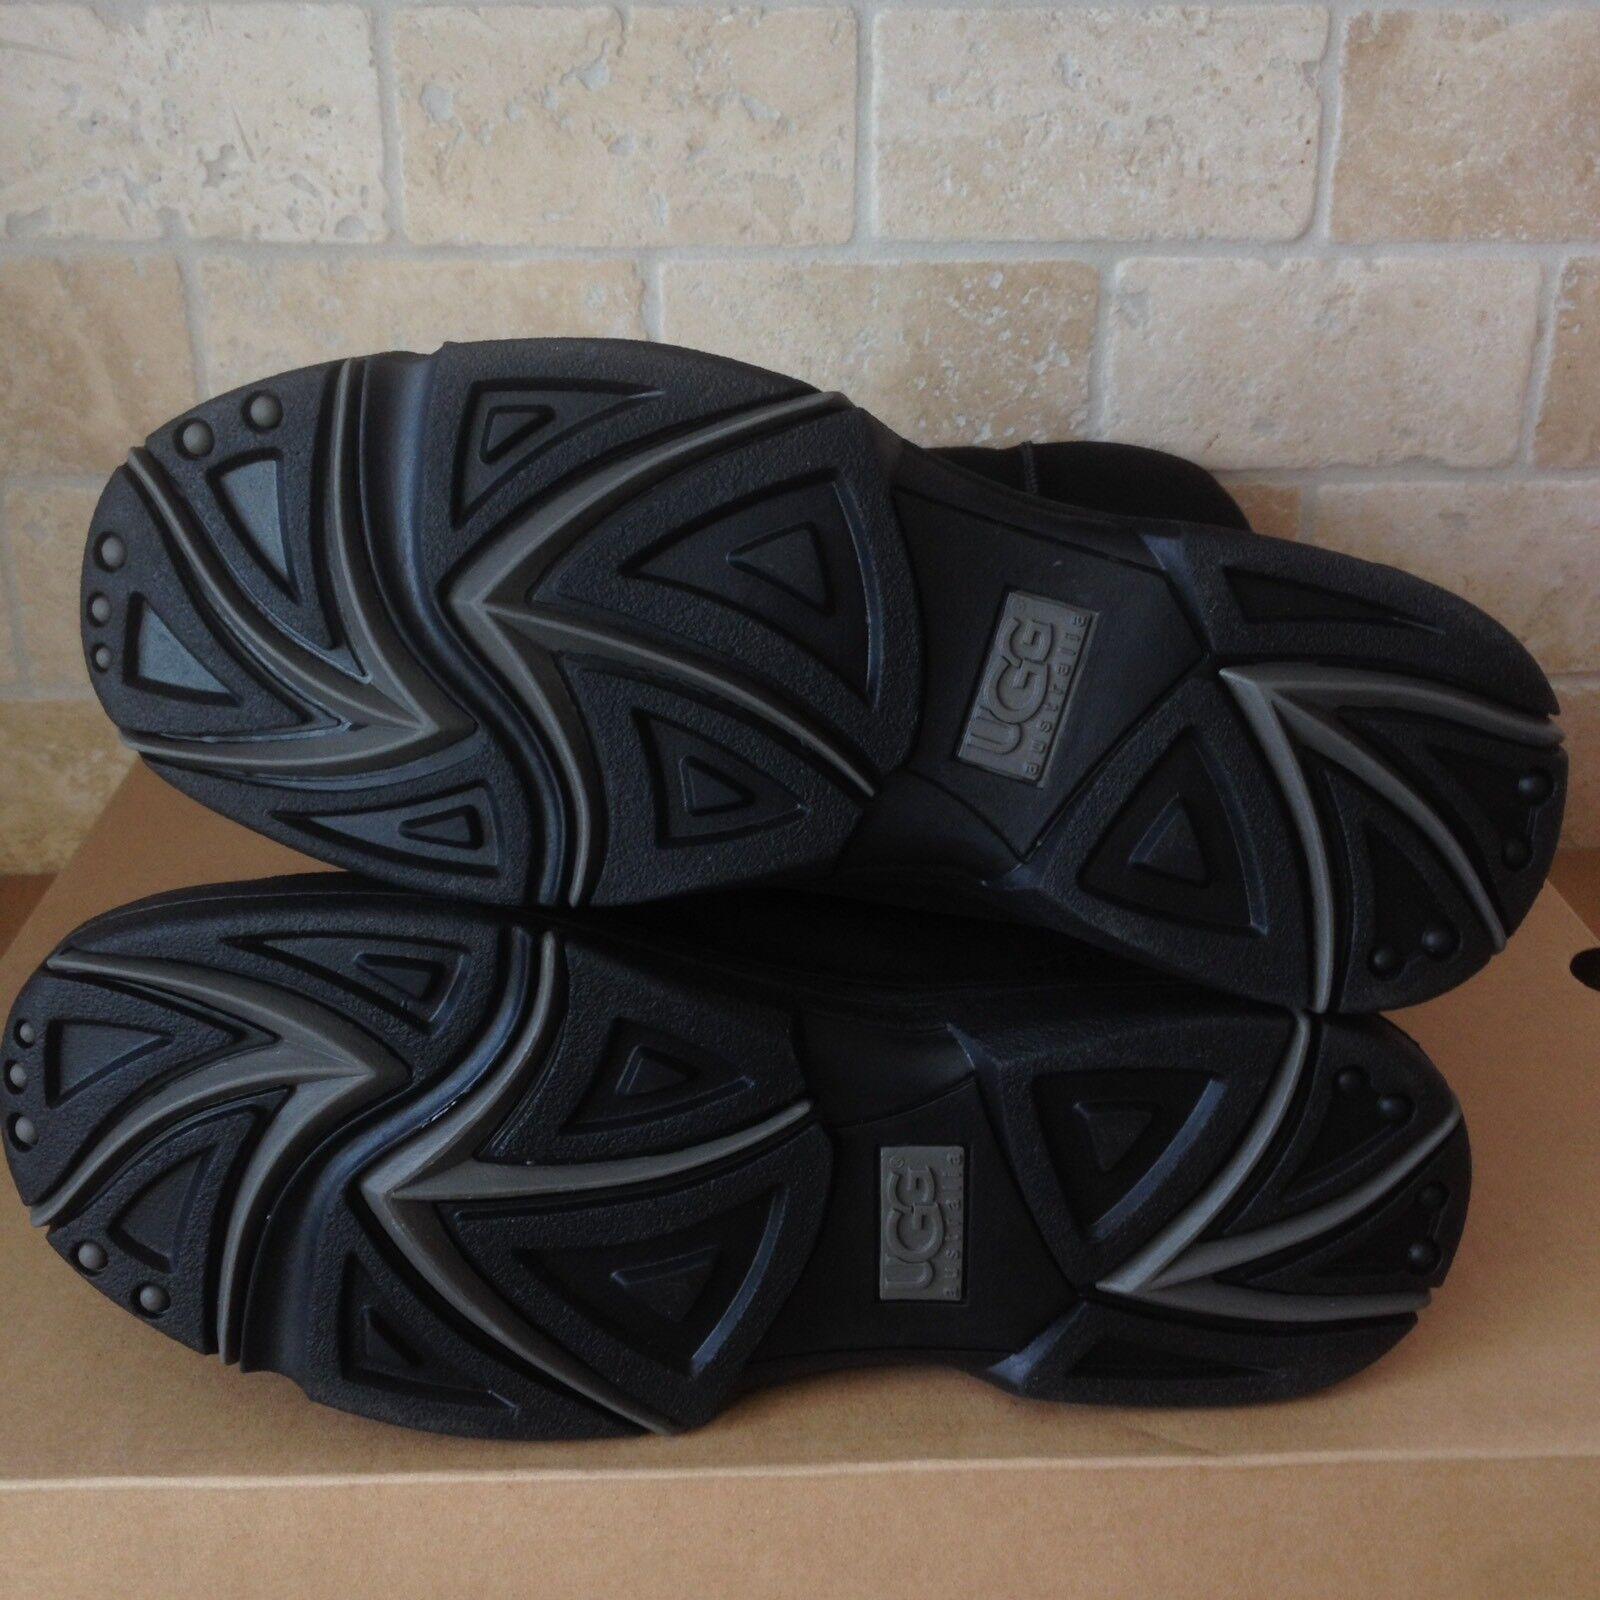 Nuevo En Caja Hunter Hunter Verde Original Tour Alto 5 Botas de Lluvia Zapatos EE. UU. 5 Alto Reino Unido 3 39dfcf